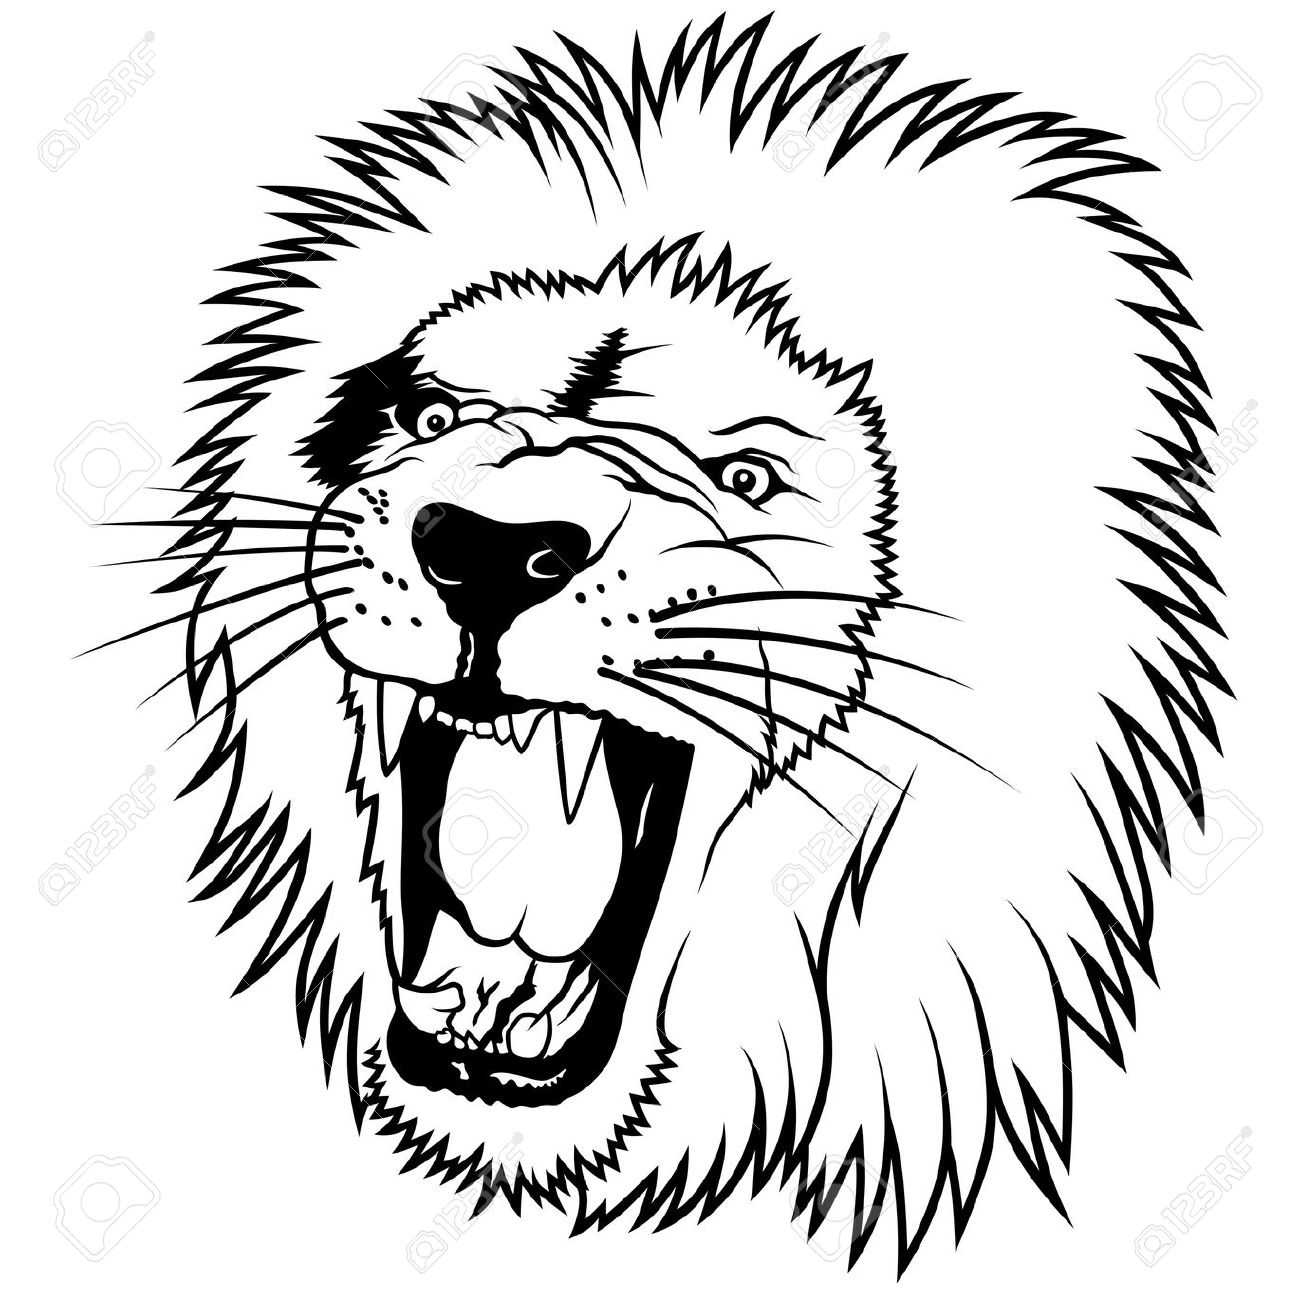 1300x1300 Drawn Lion Illustration